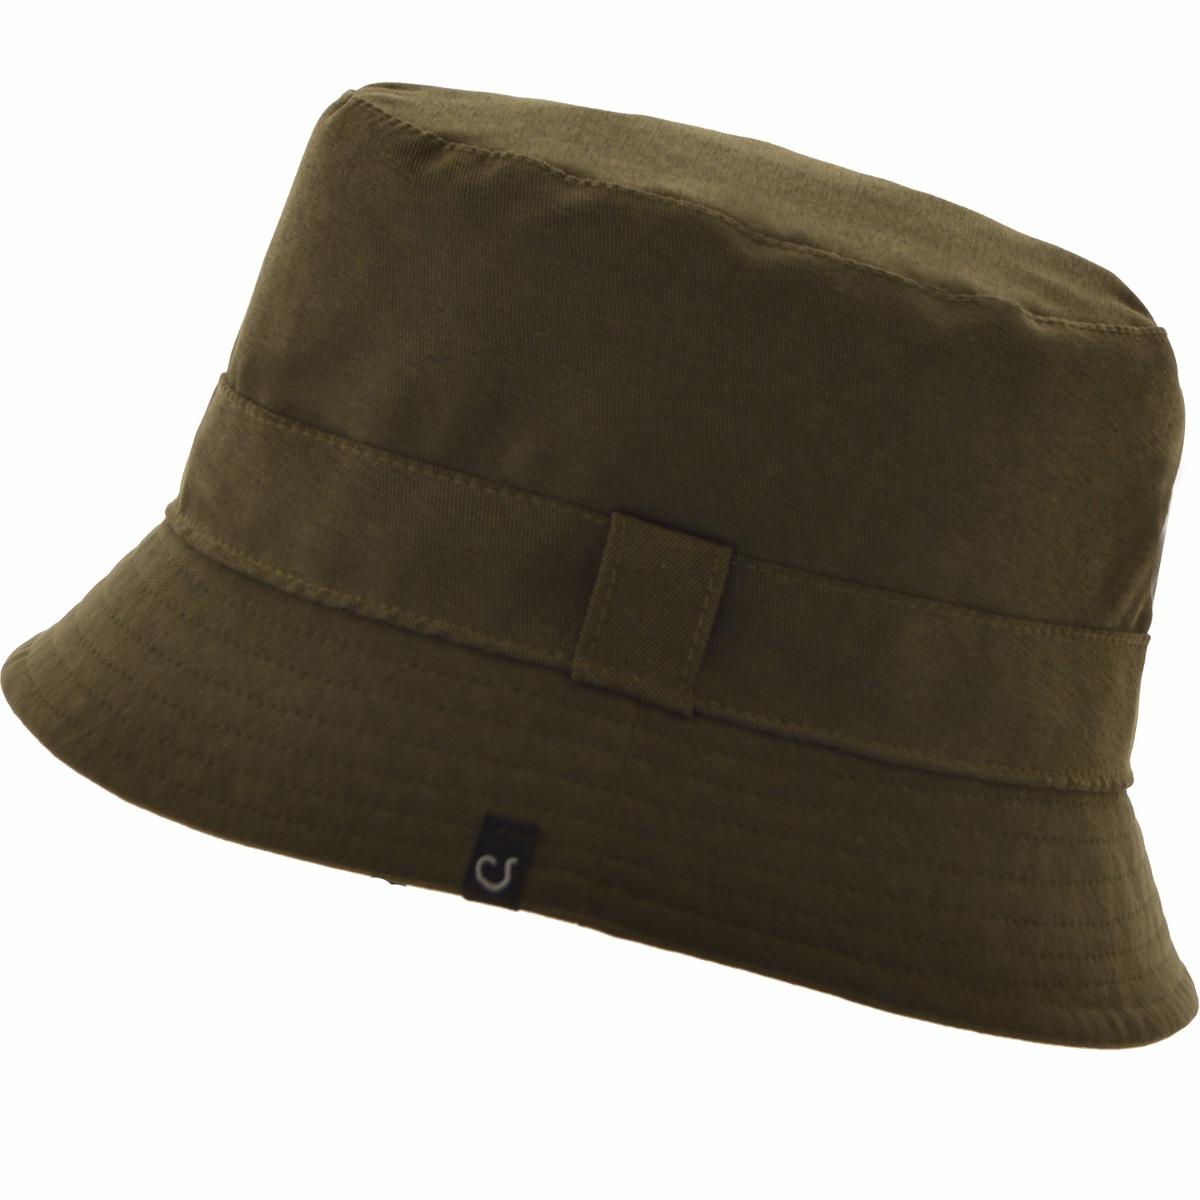 sombrero human sarge lluvia compañia de sombreros m522202-04. Cargando zoom. 9e32fb954dc8